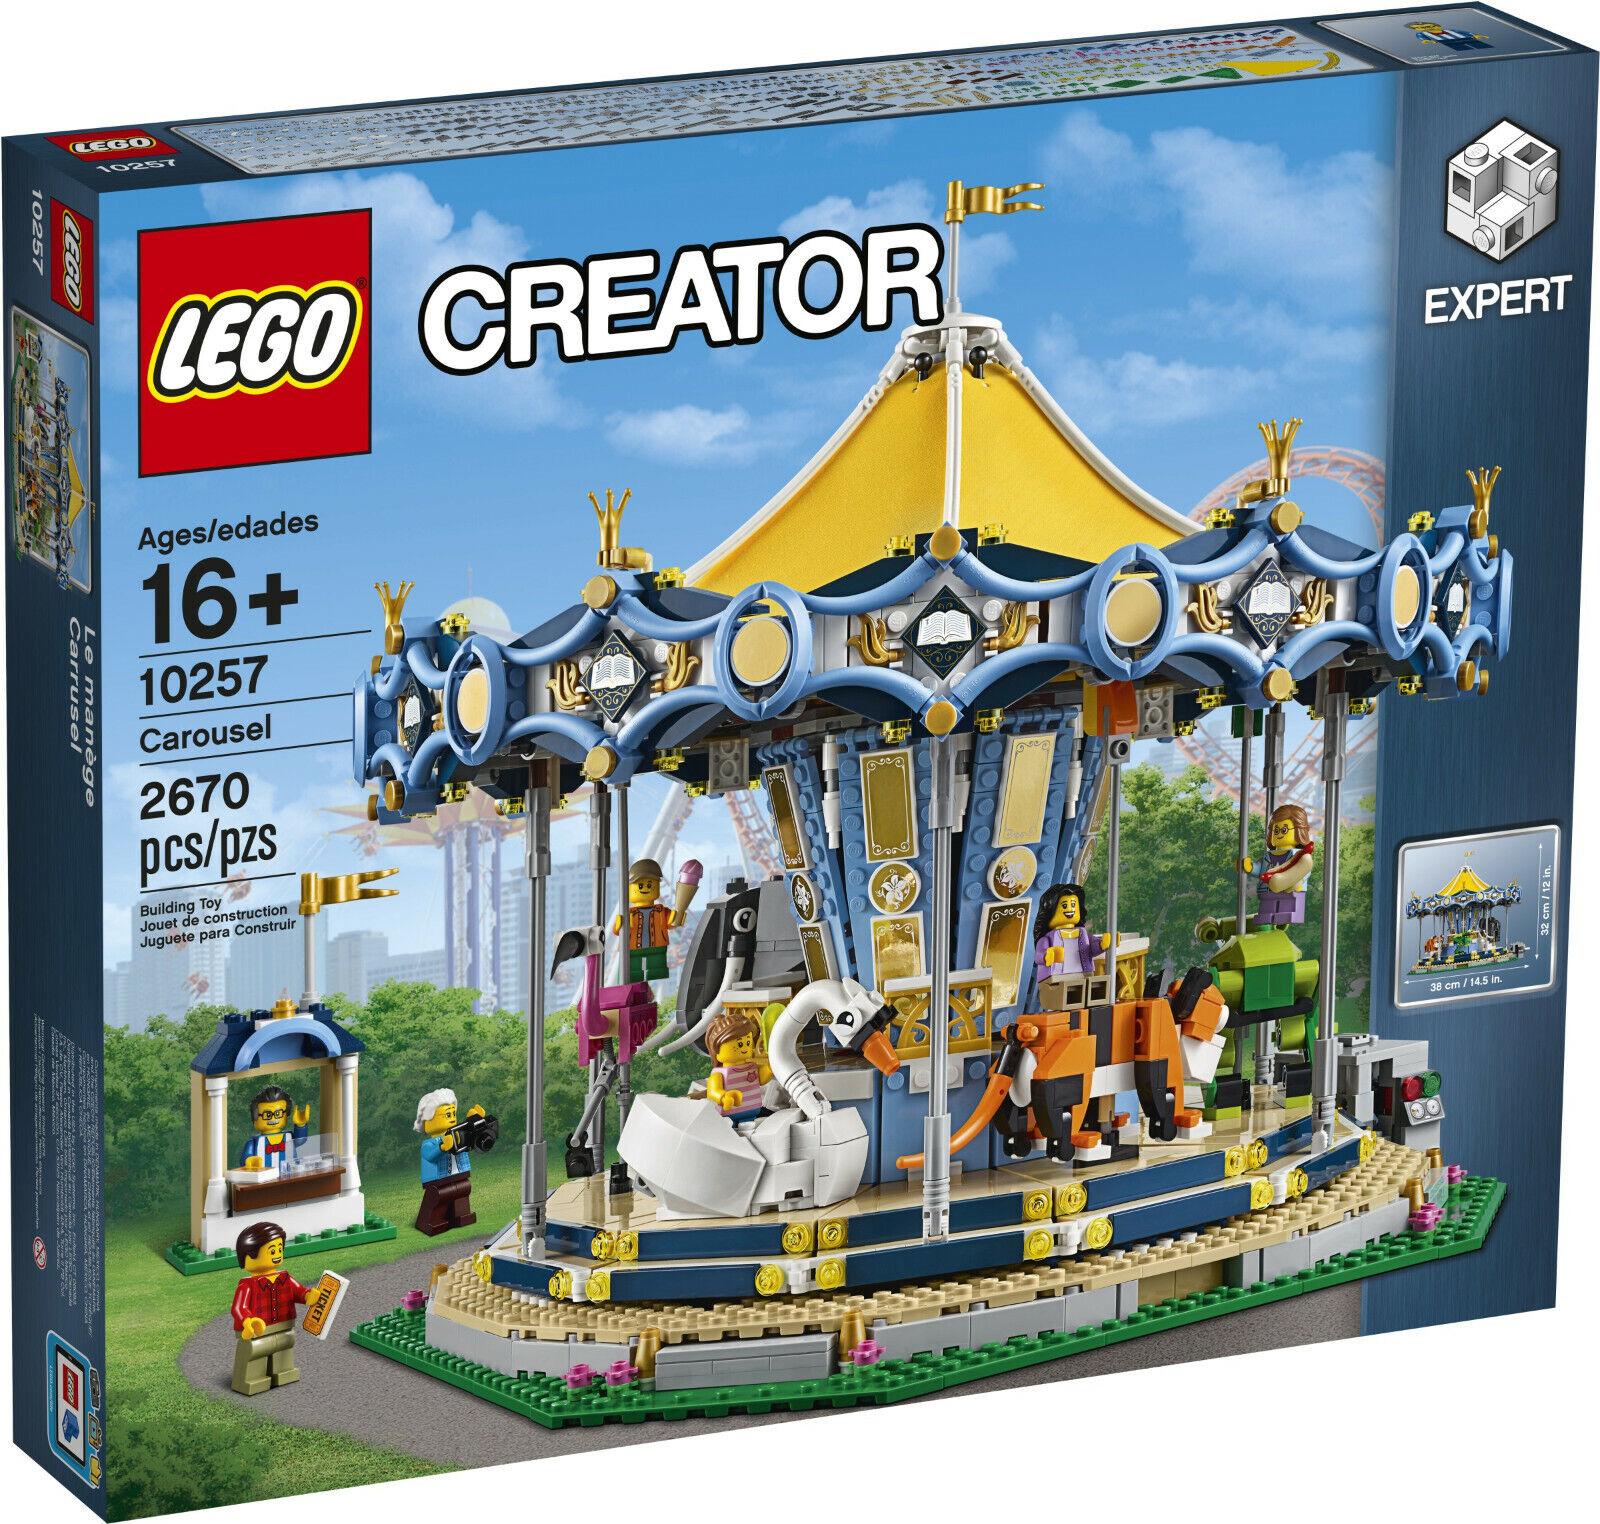 Lego 10257 - Creator Expert - Karussel (Carousel Fairground)